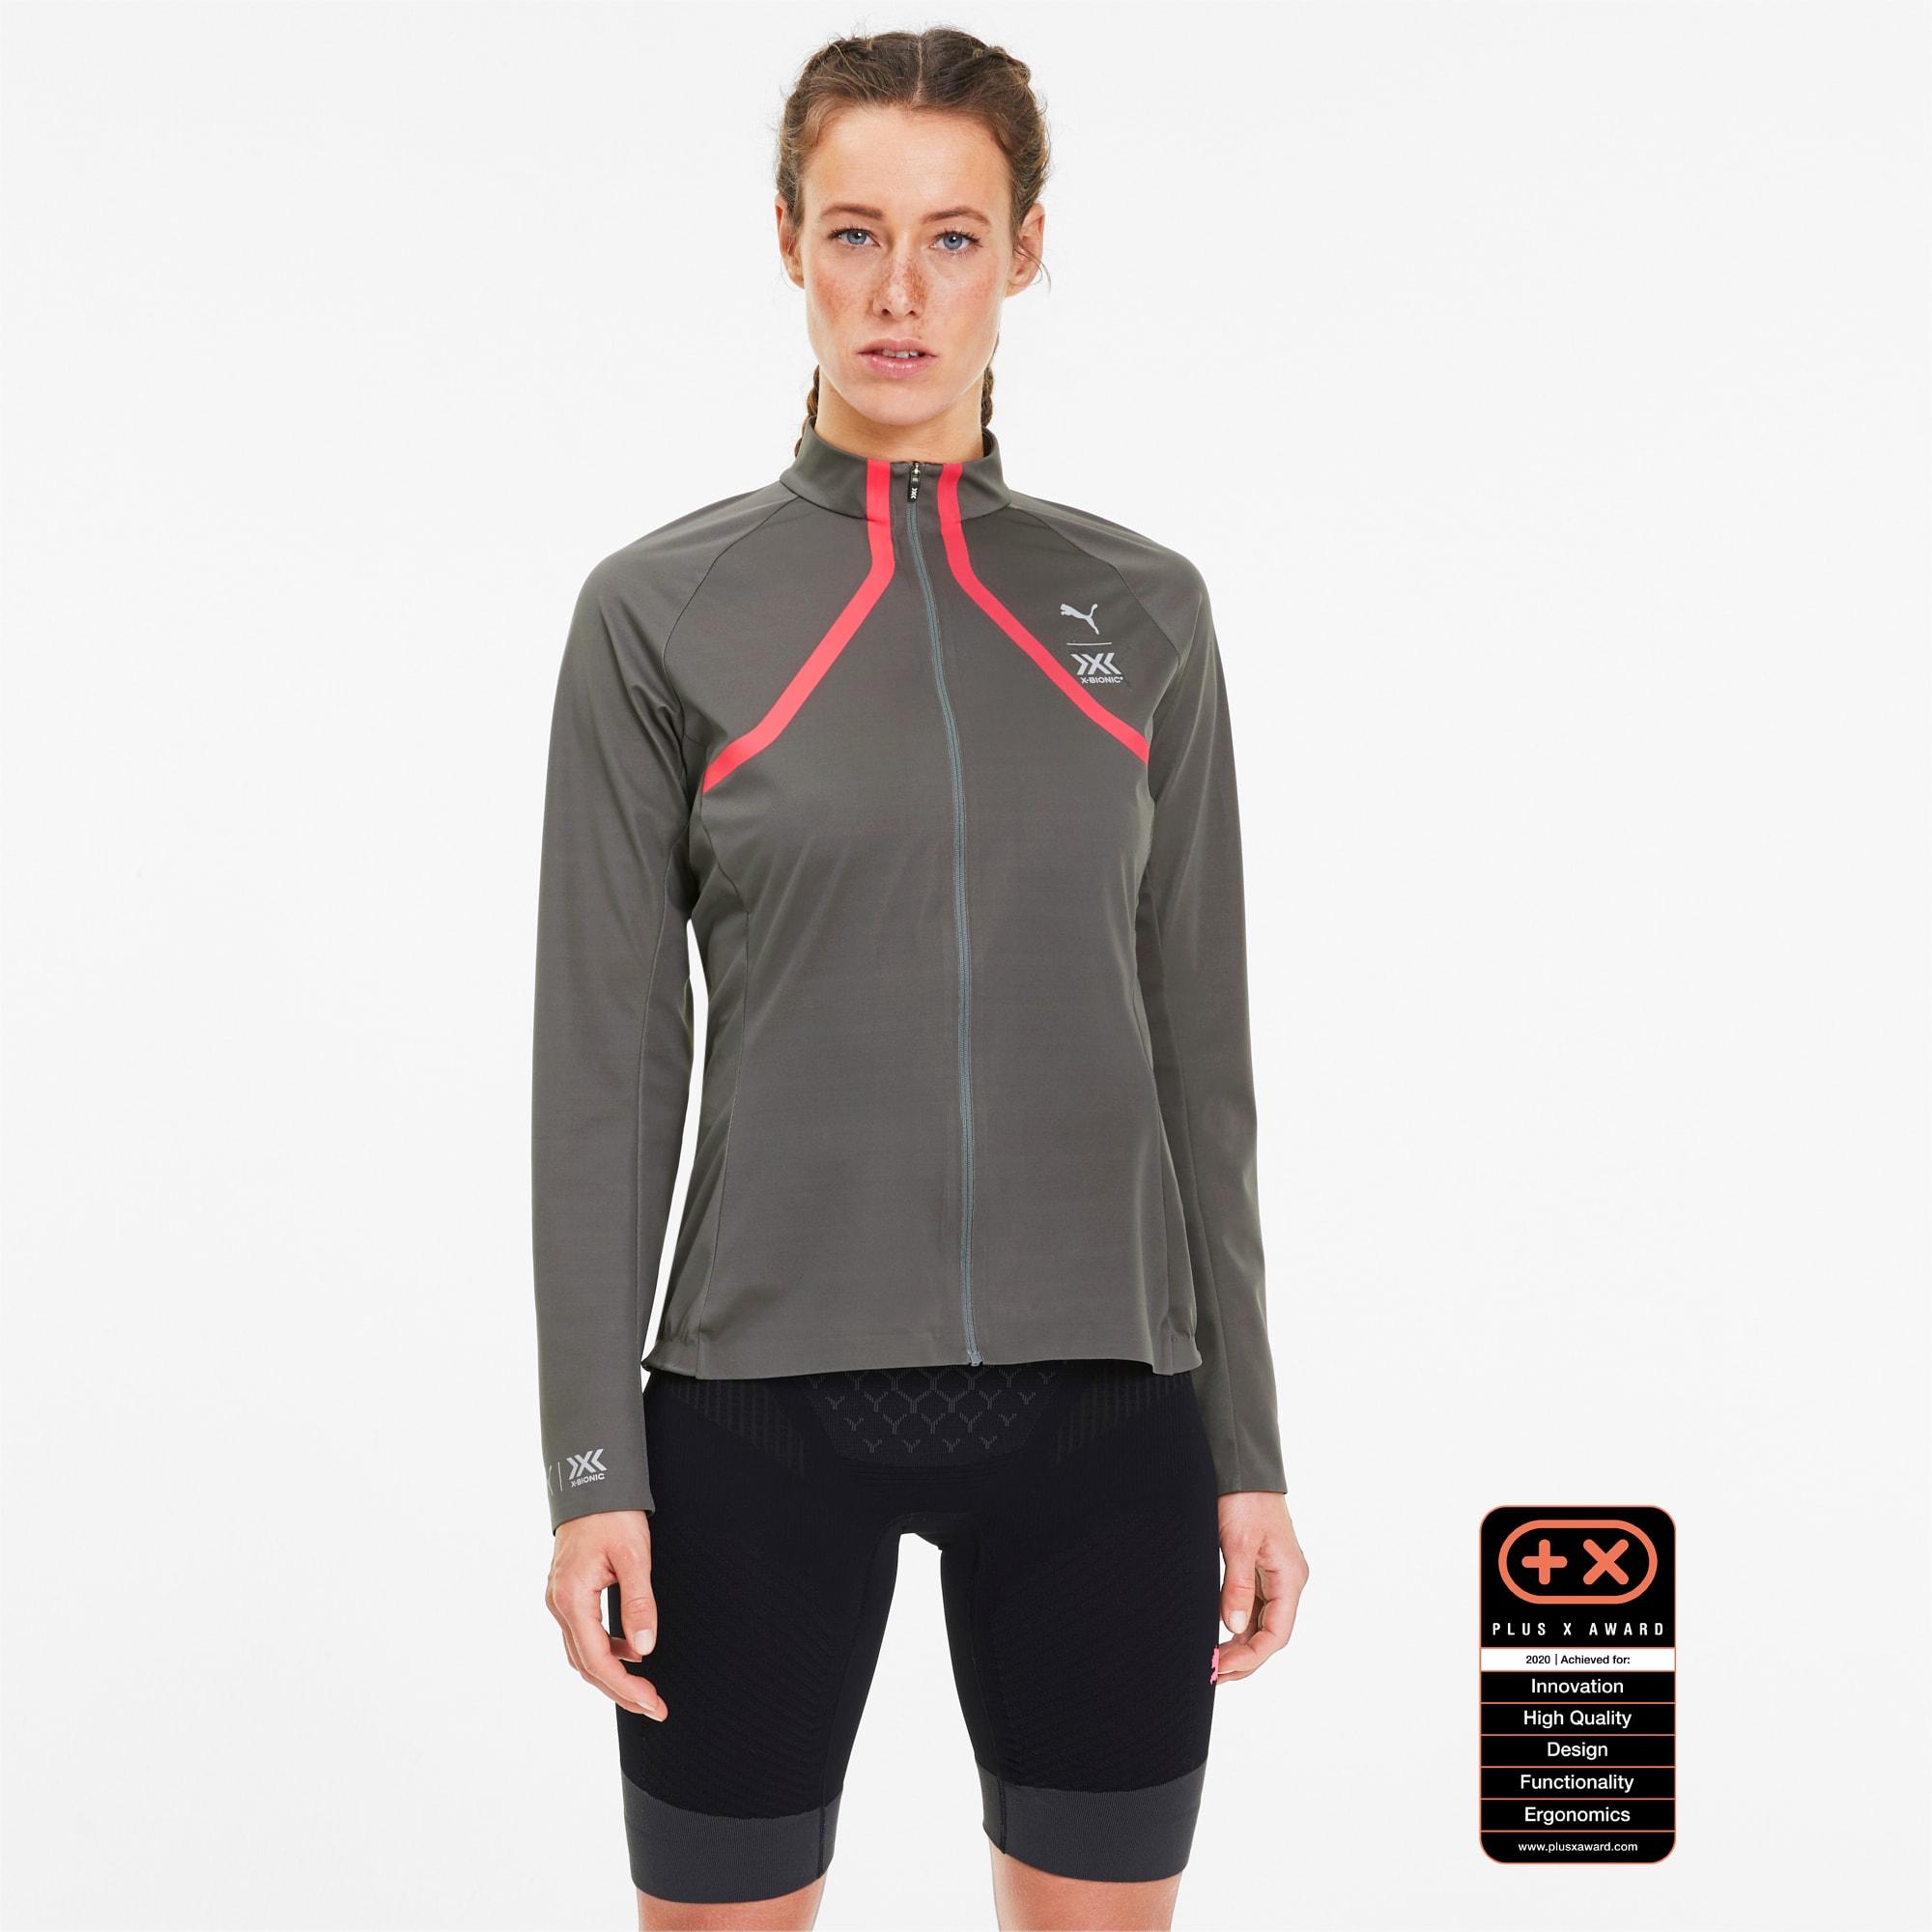 Image of PUMA by X-BIONIC RainSphere Damen Running Jacke | Mit Aucun | Grau/Rosa | Größe: L